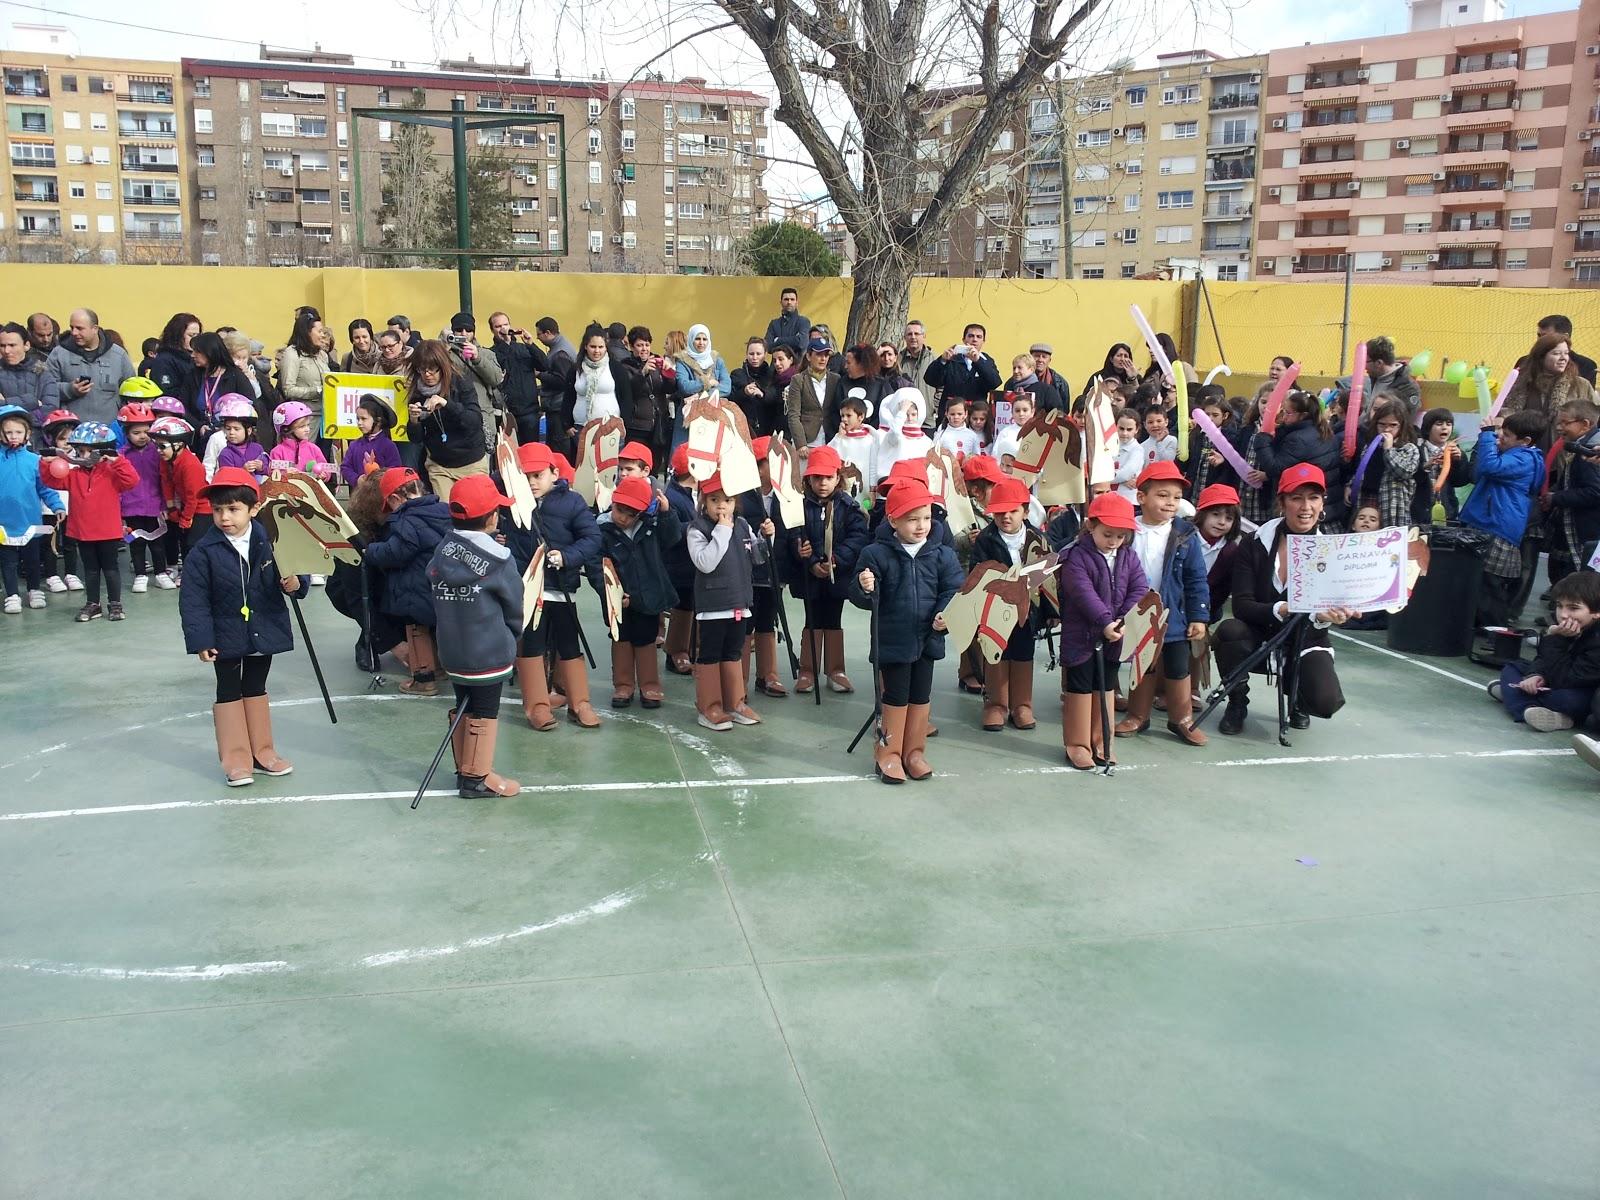 Apa colegio academia jardin carnaval 2013 sesi n de ma ana for Colegio jardin de africa